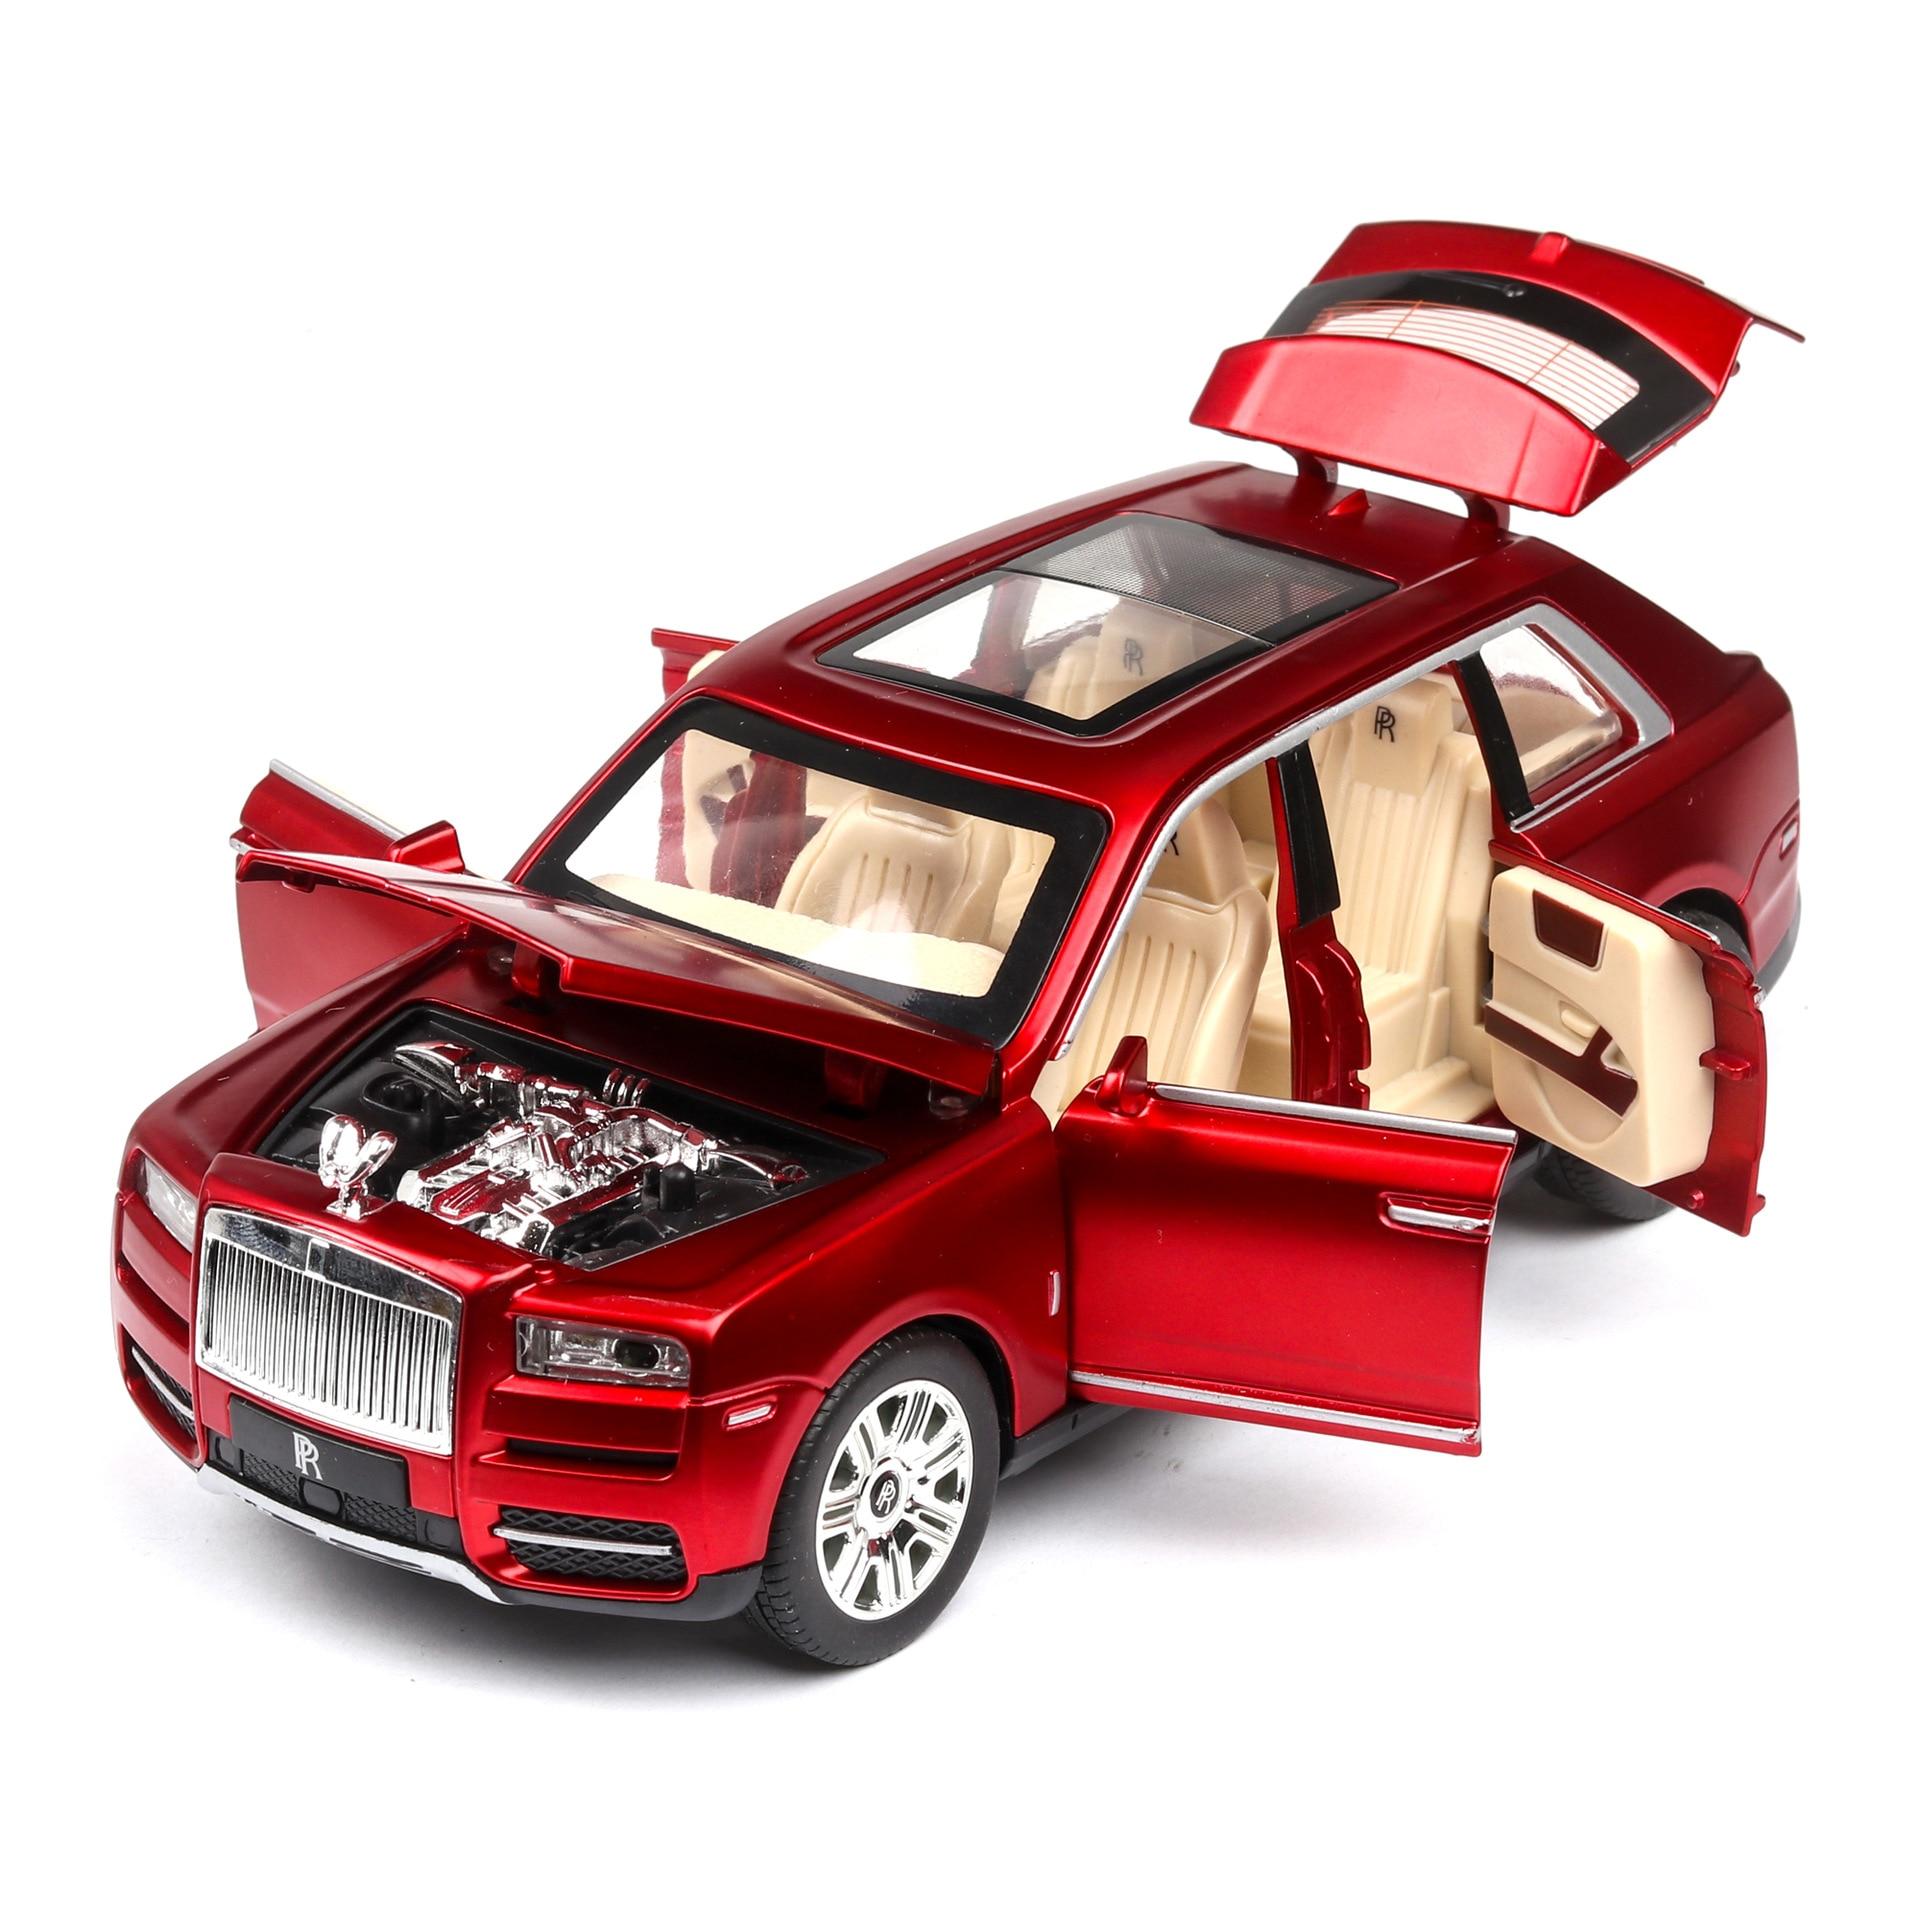 1:24 Diecast Car Model Toy Vehicle Rolls Royces Cullinan SUV Metal Wheels Sound Light Pull Back Car For Kids Toy Car Boy Gift